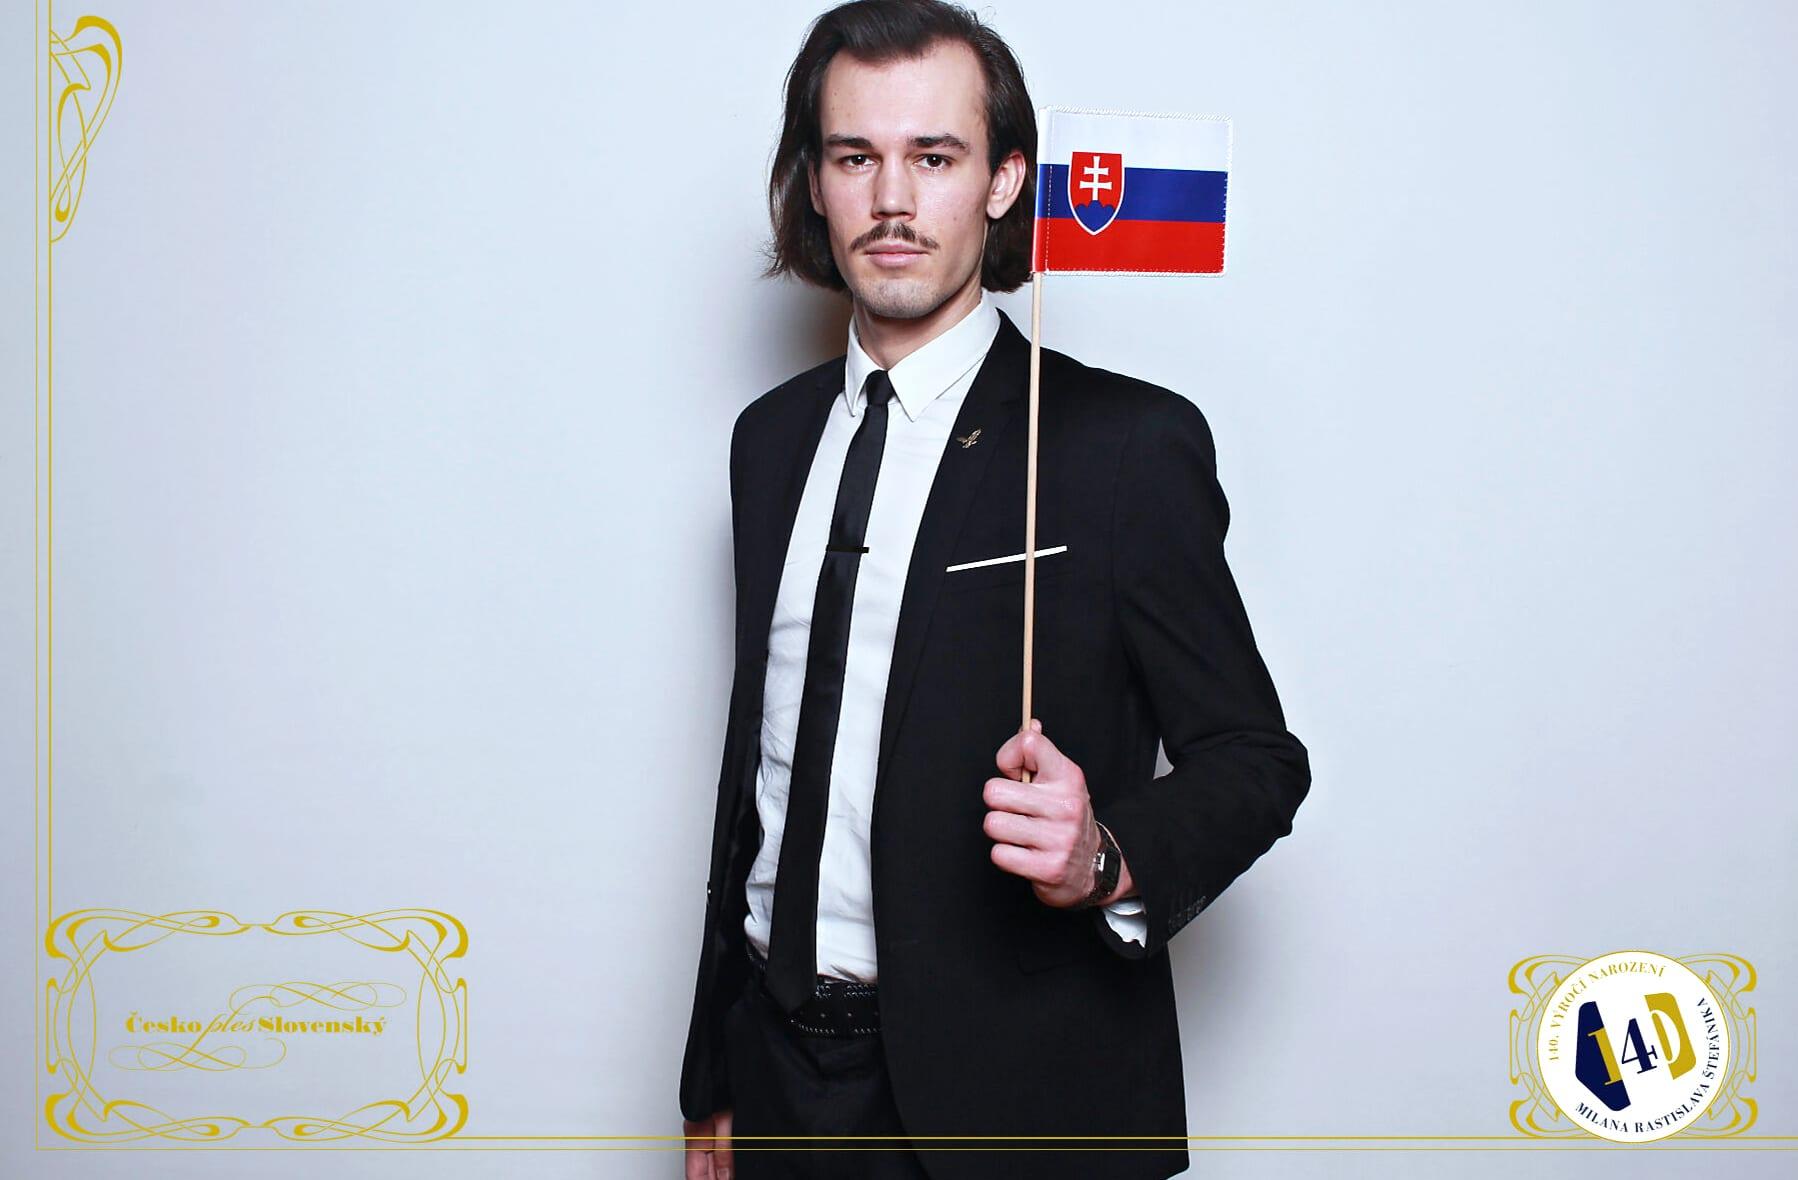 fotokoutek-ples-praha-ceskoslovensky-ples-8-2-2020-718408